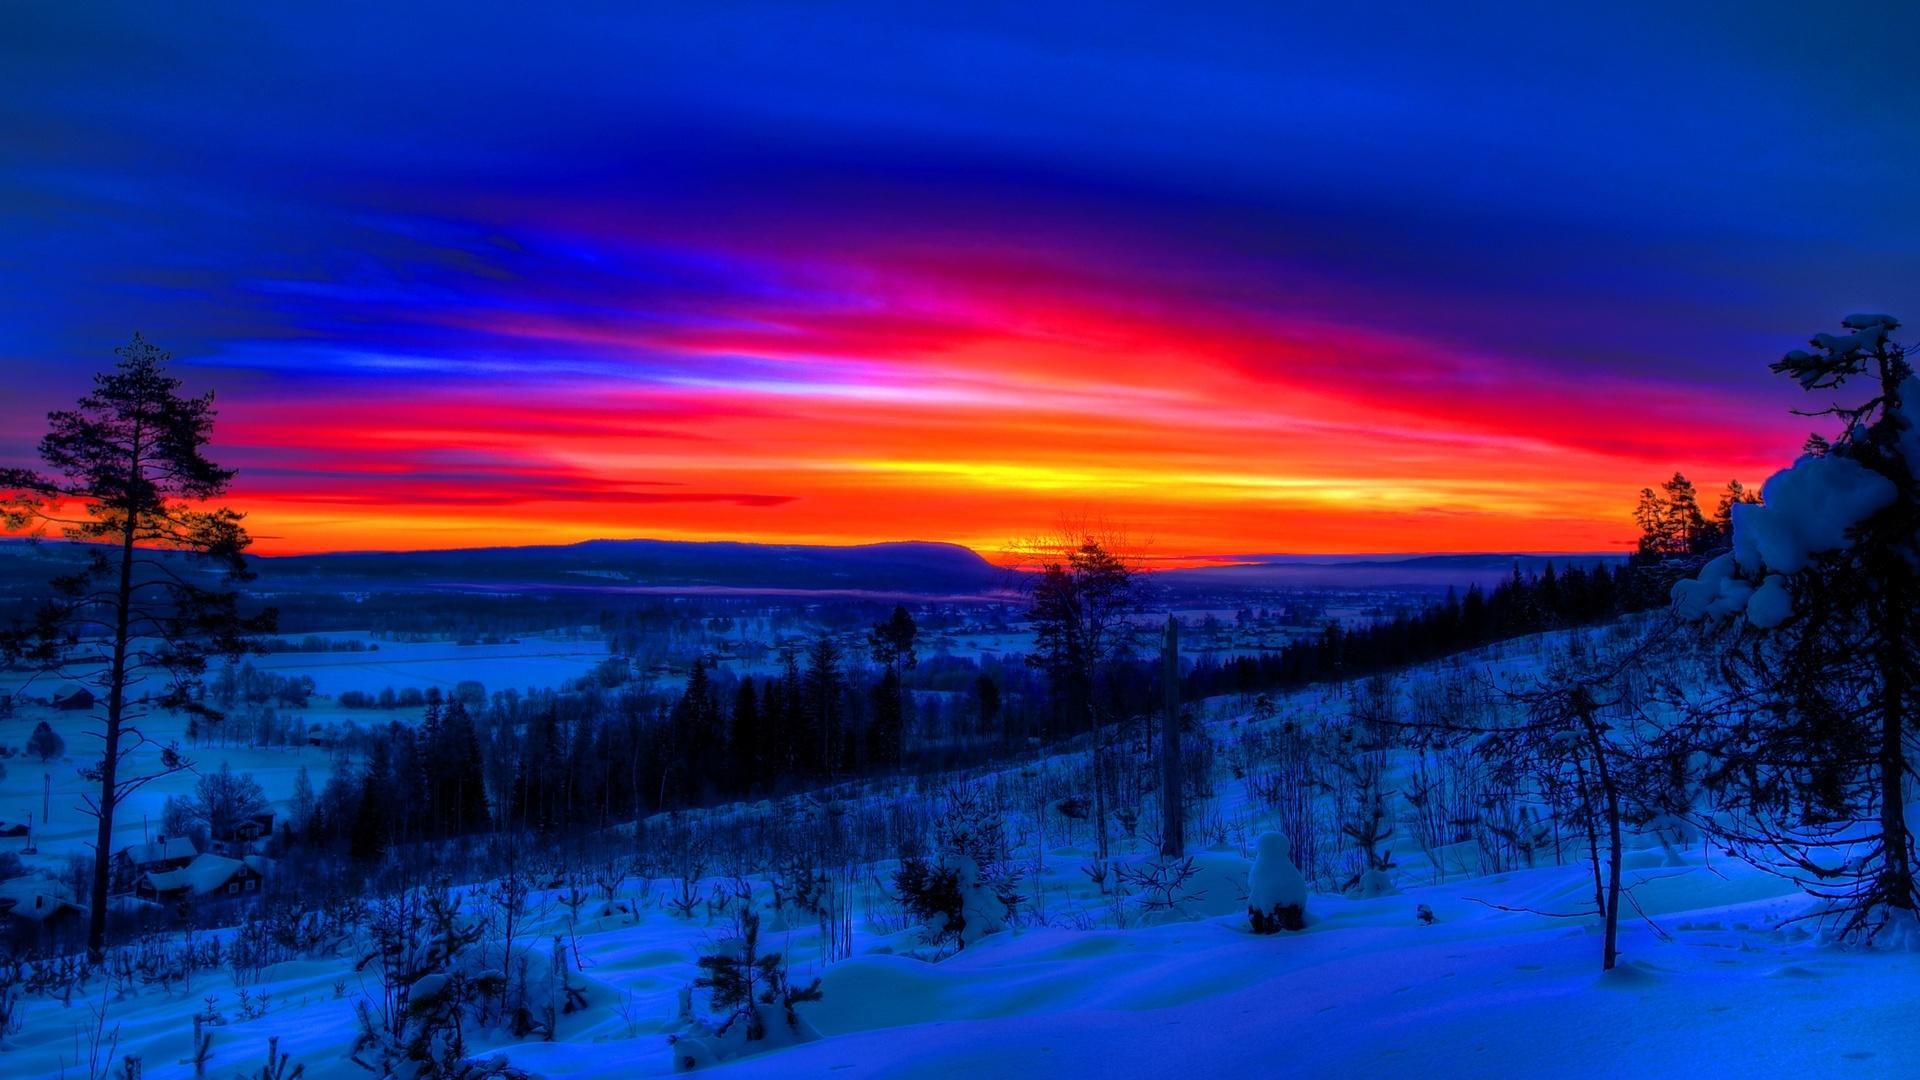 Winter Sunset Image